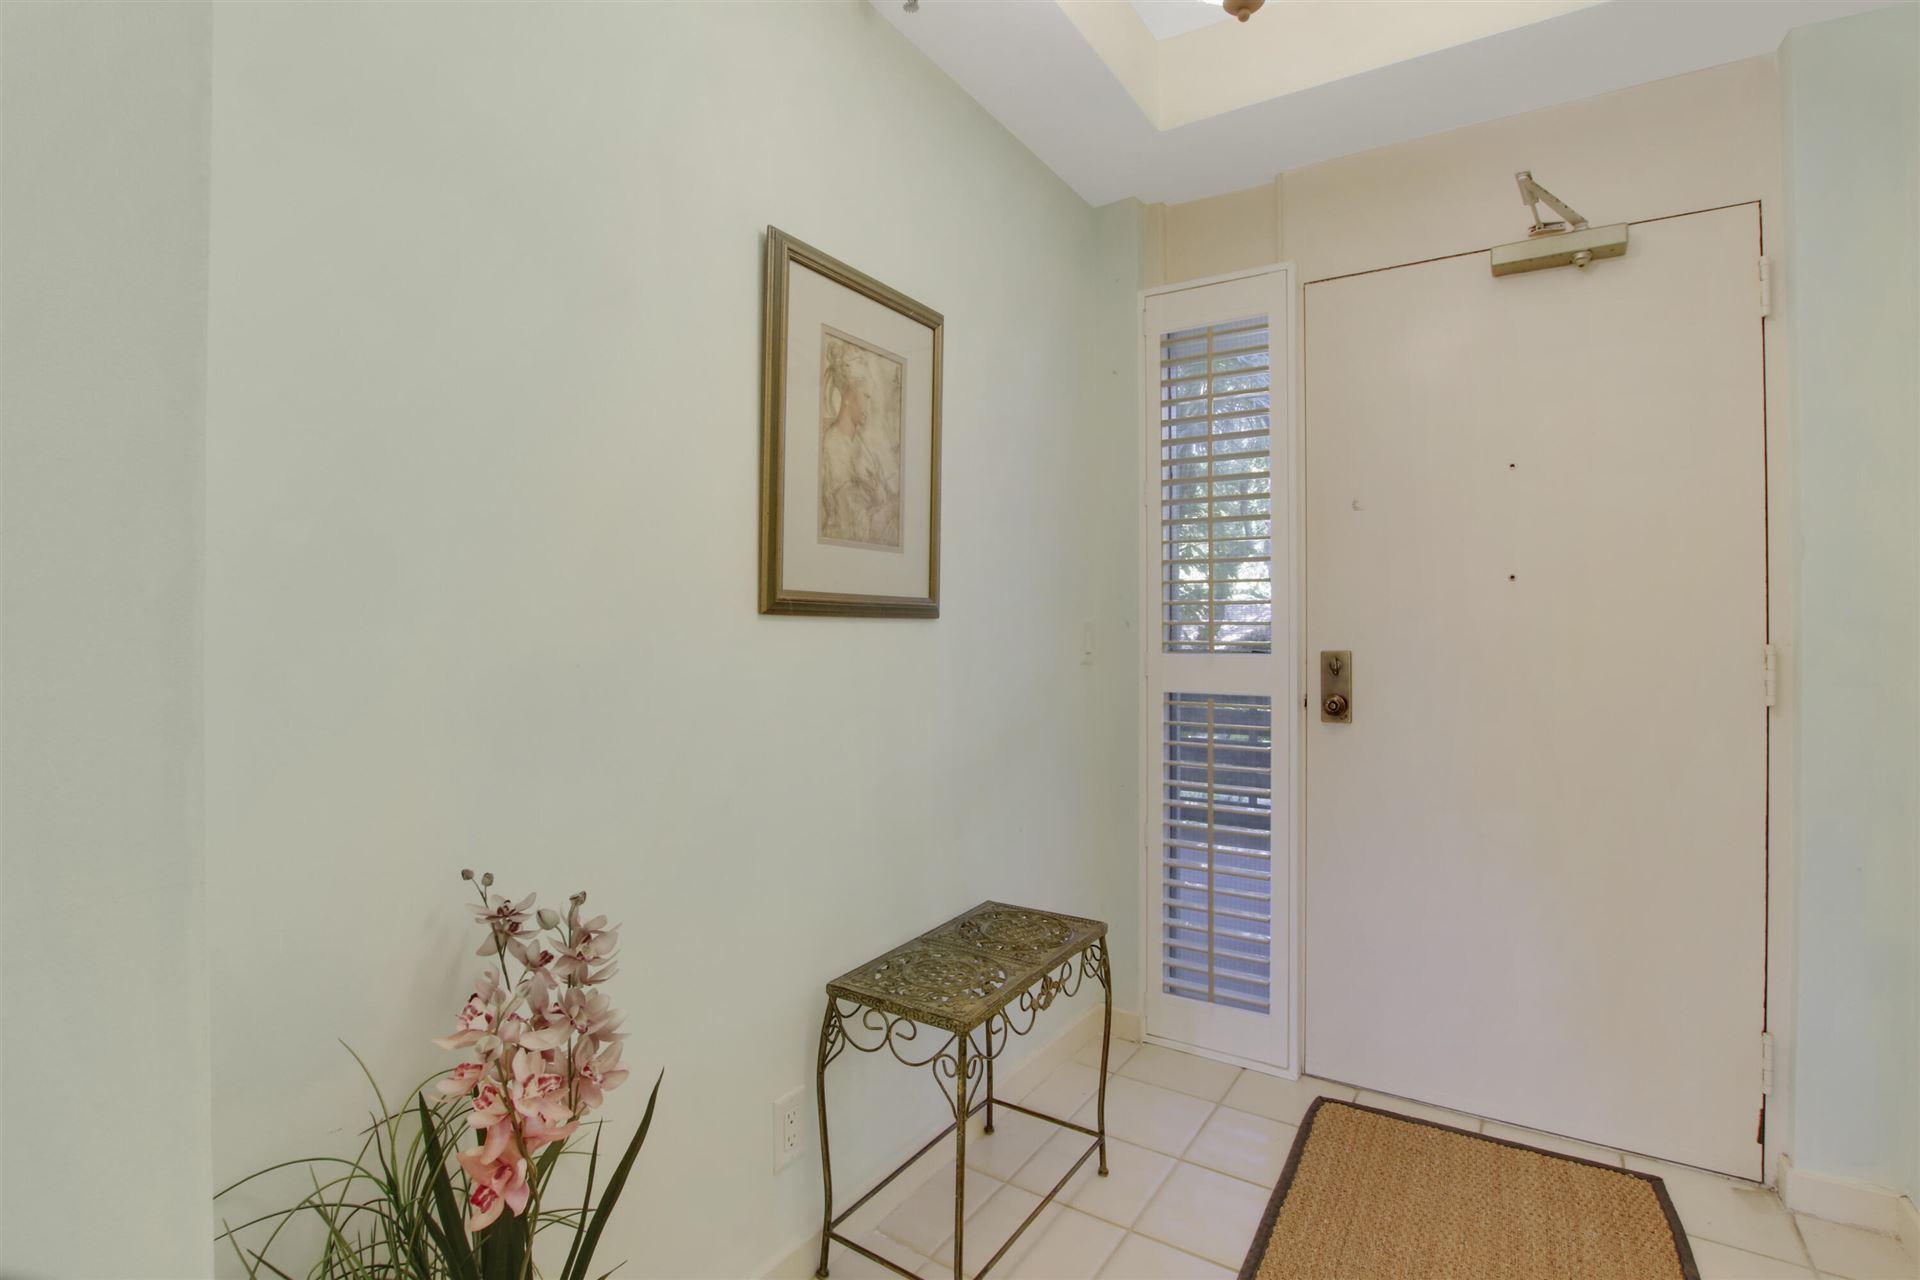 Photo of 11370 Twelve Oaks Way #212, North Palm Beach, FL 33408 (MLS # RX-10732211)